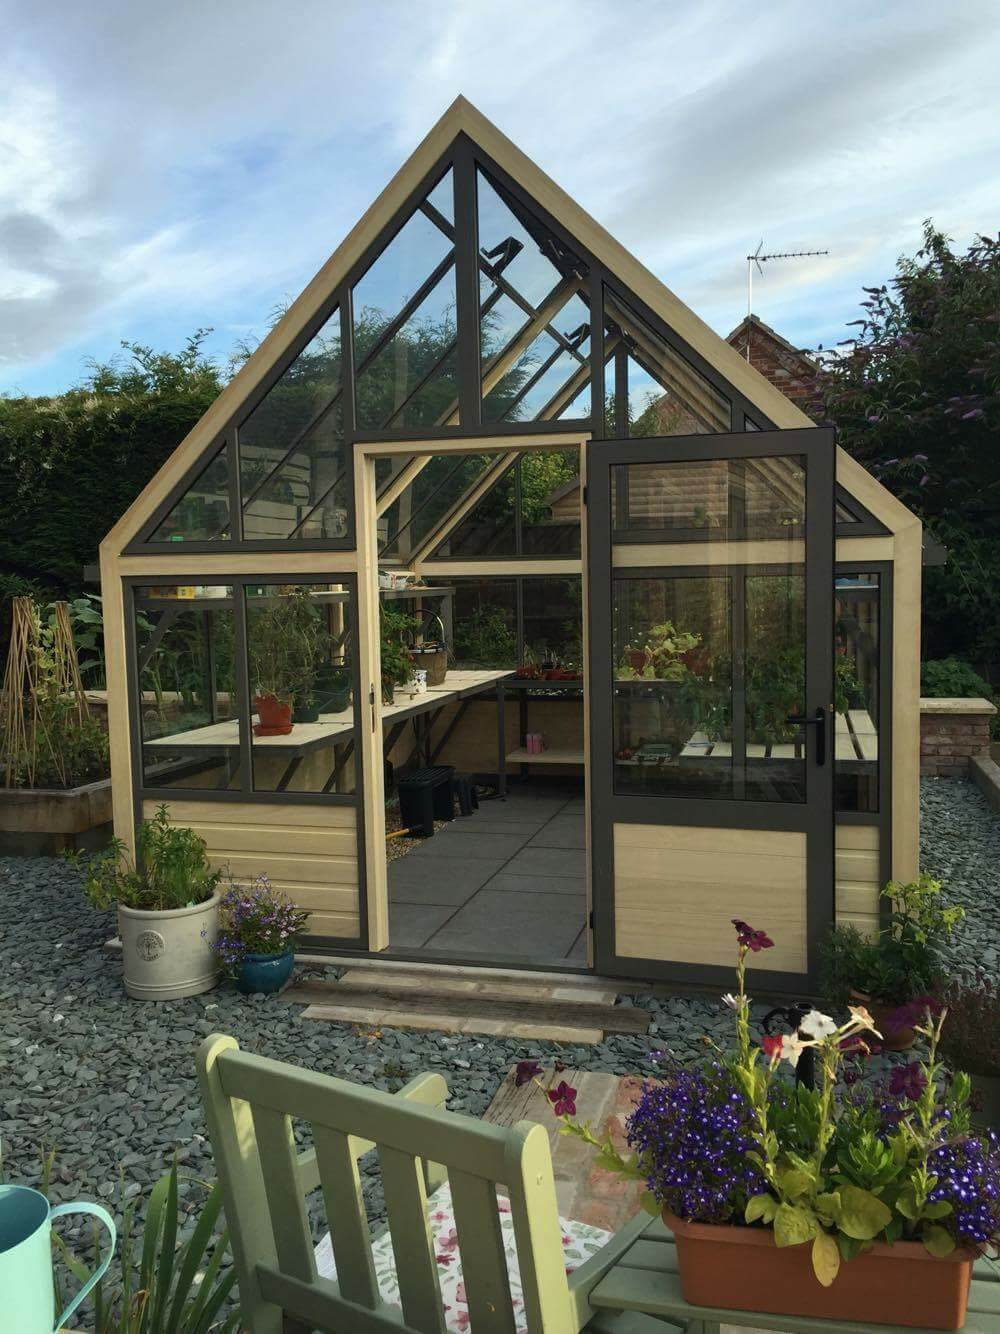 Large greenhouse with door open